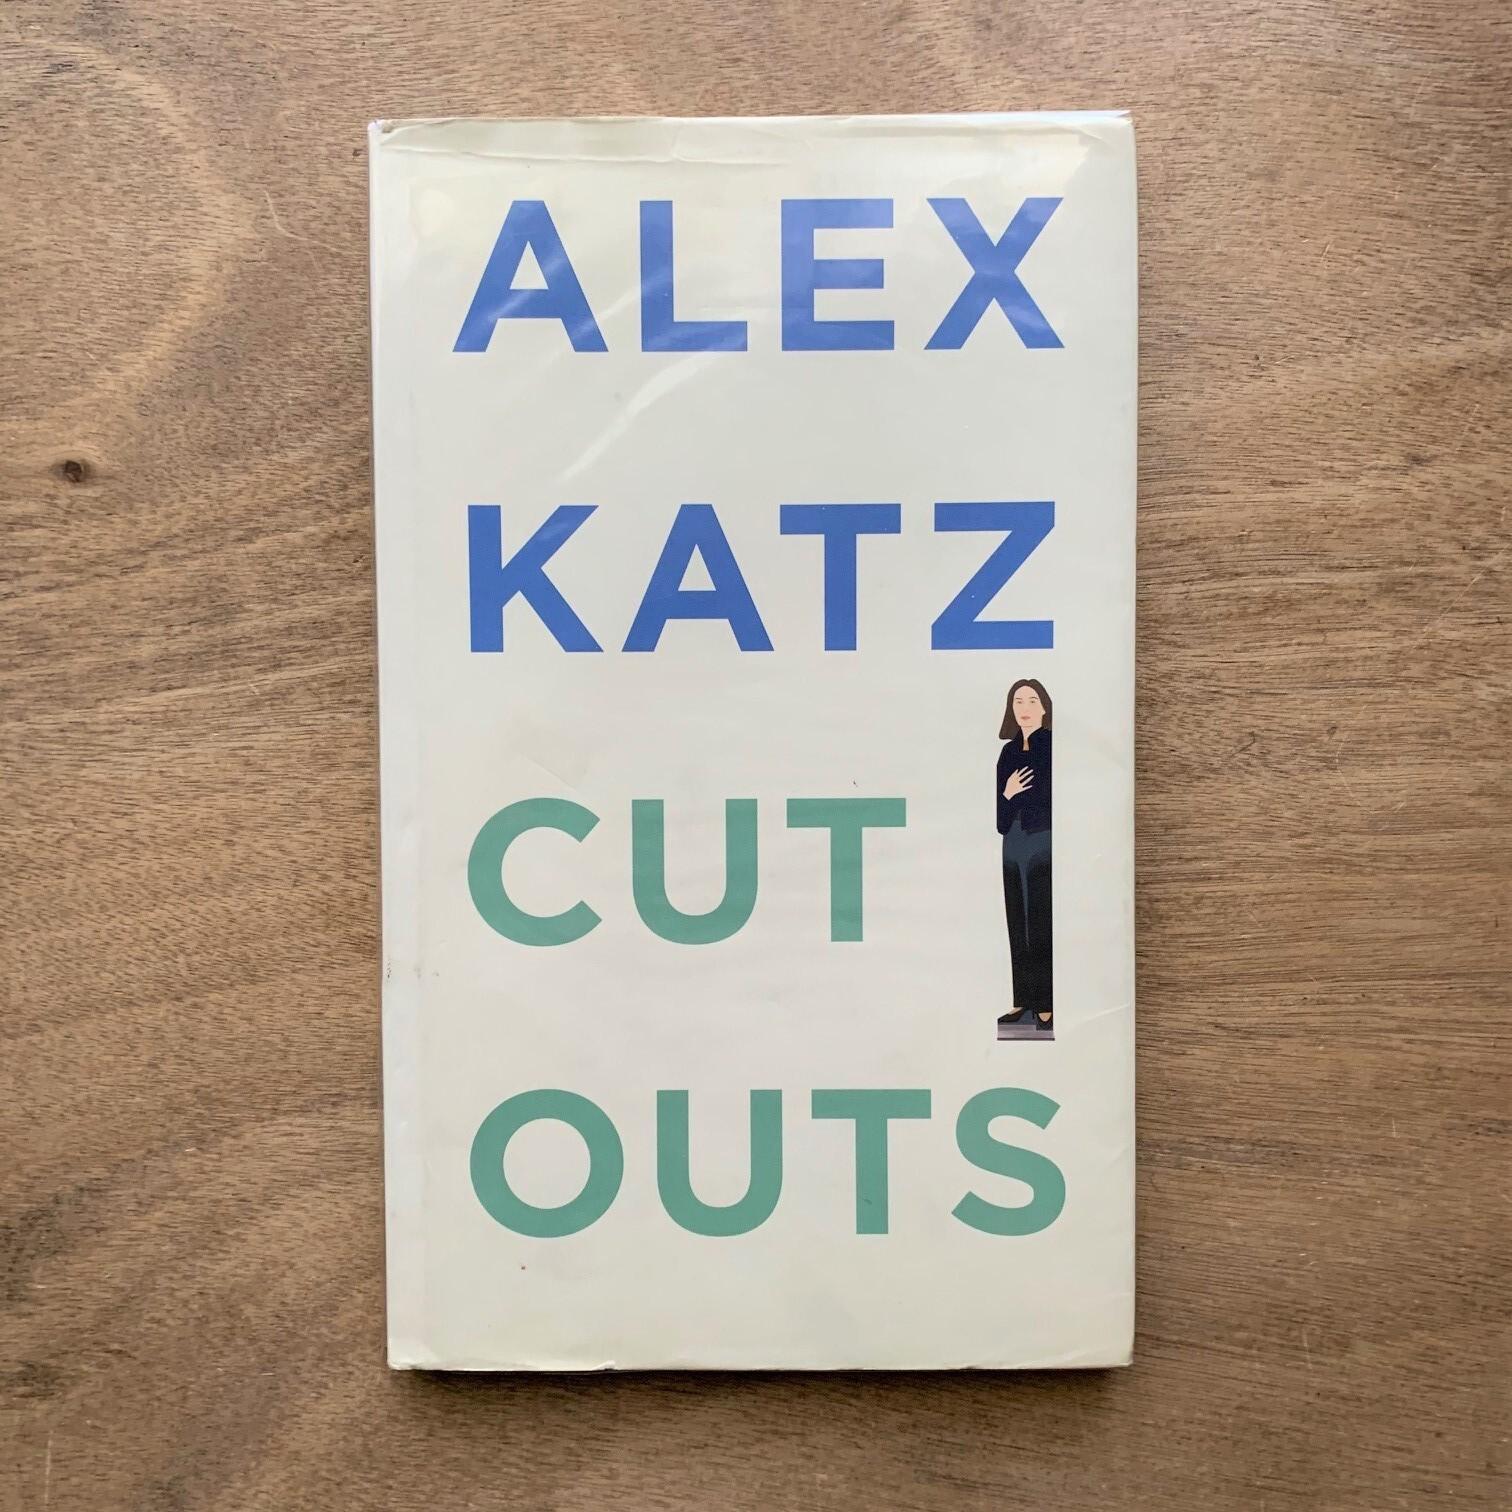 Alex Katz: Cutouts / アレックス・カッツ